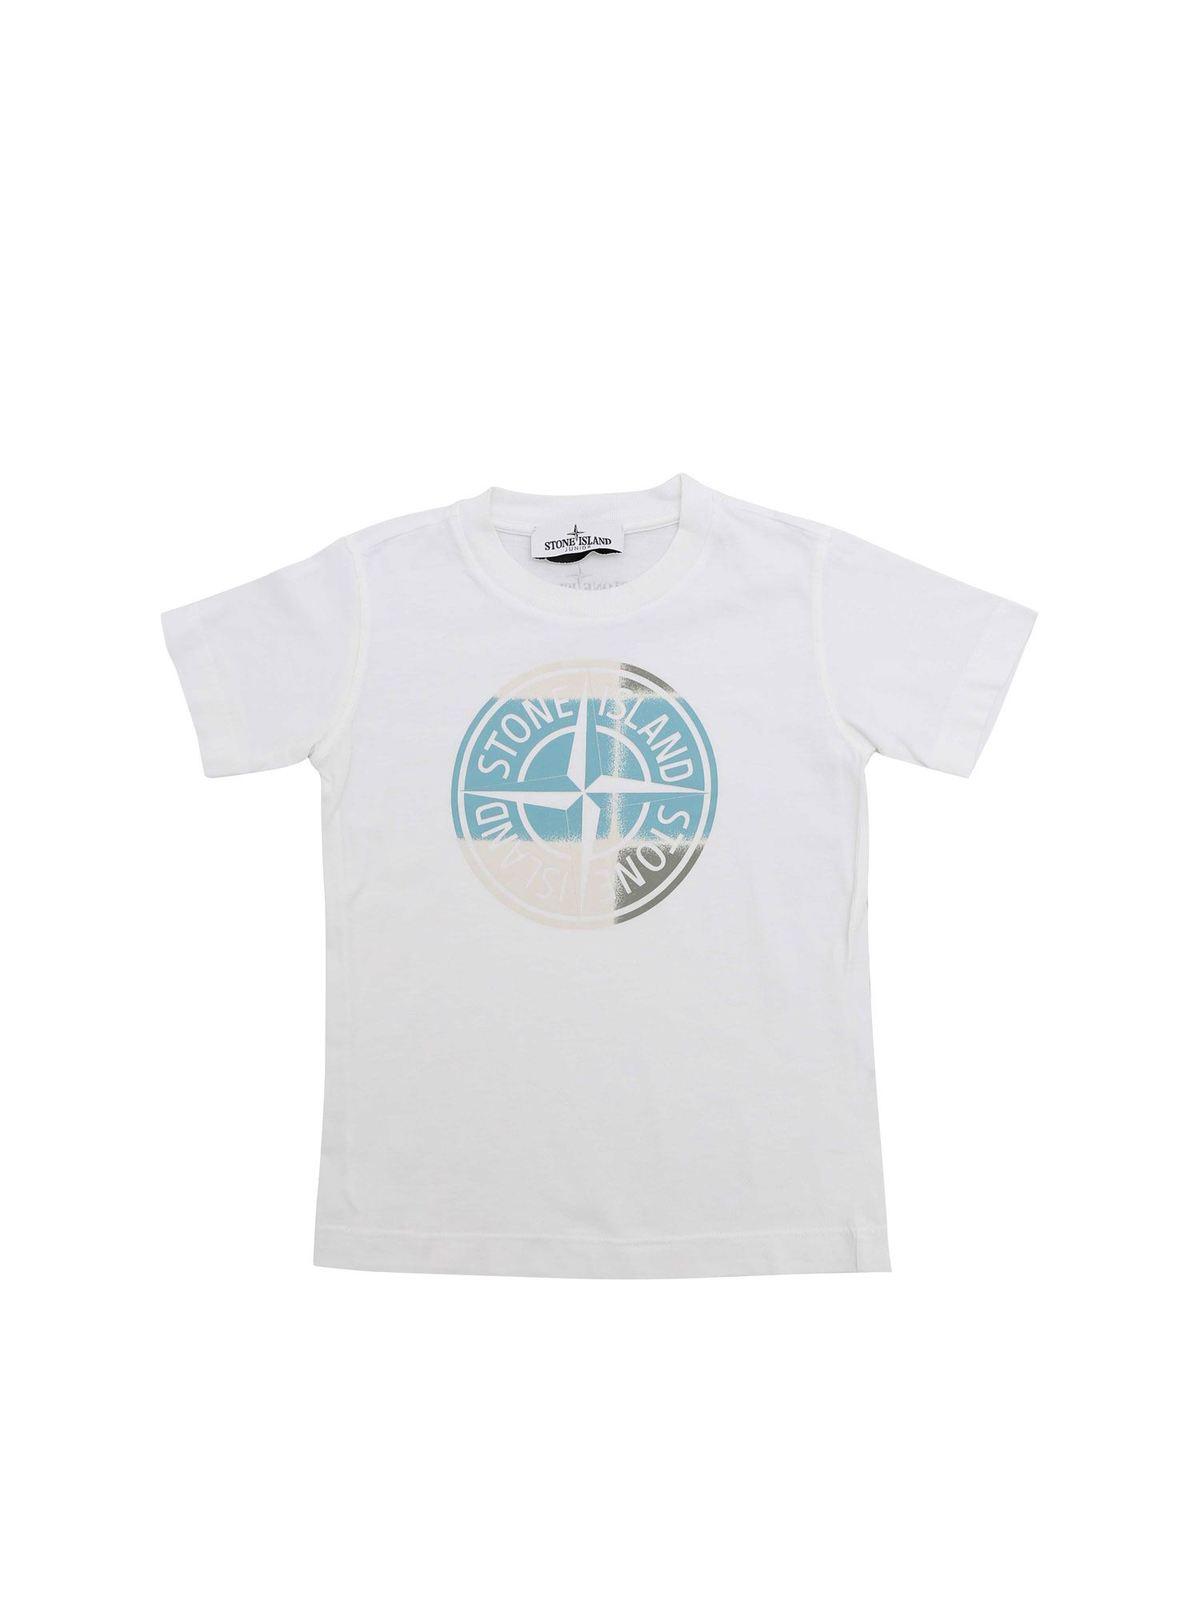 Stone Island Junior LOGO PRINT T-SHIRT IN WHITE